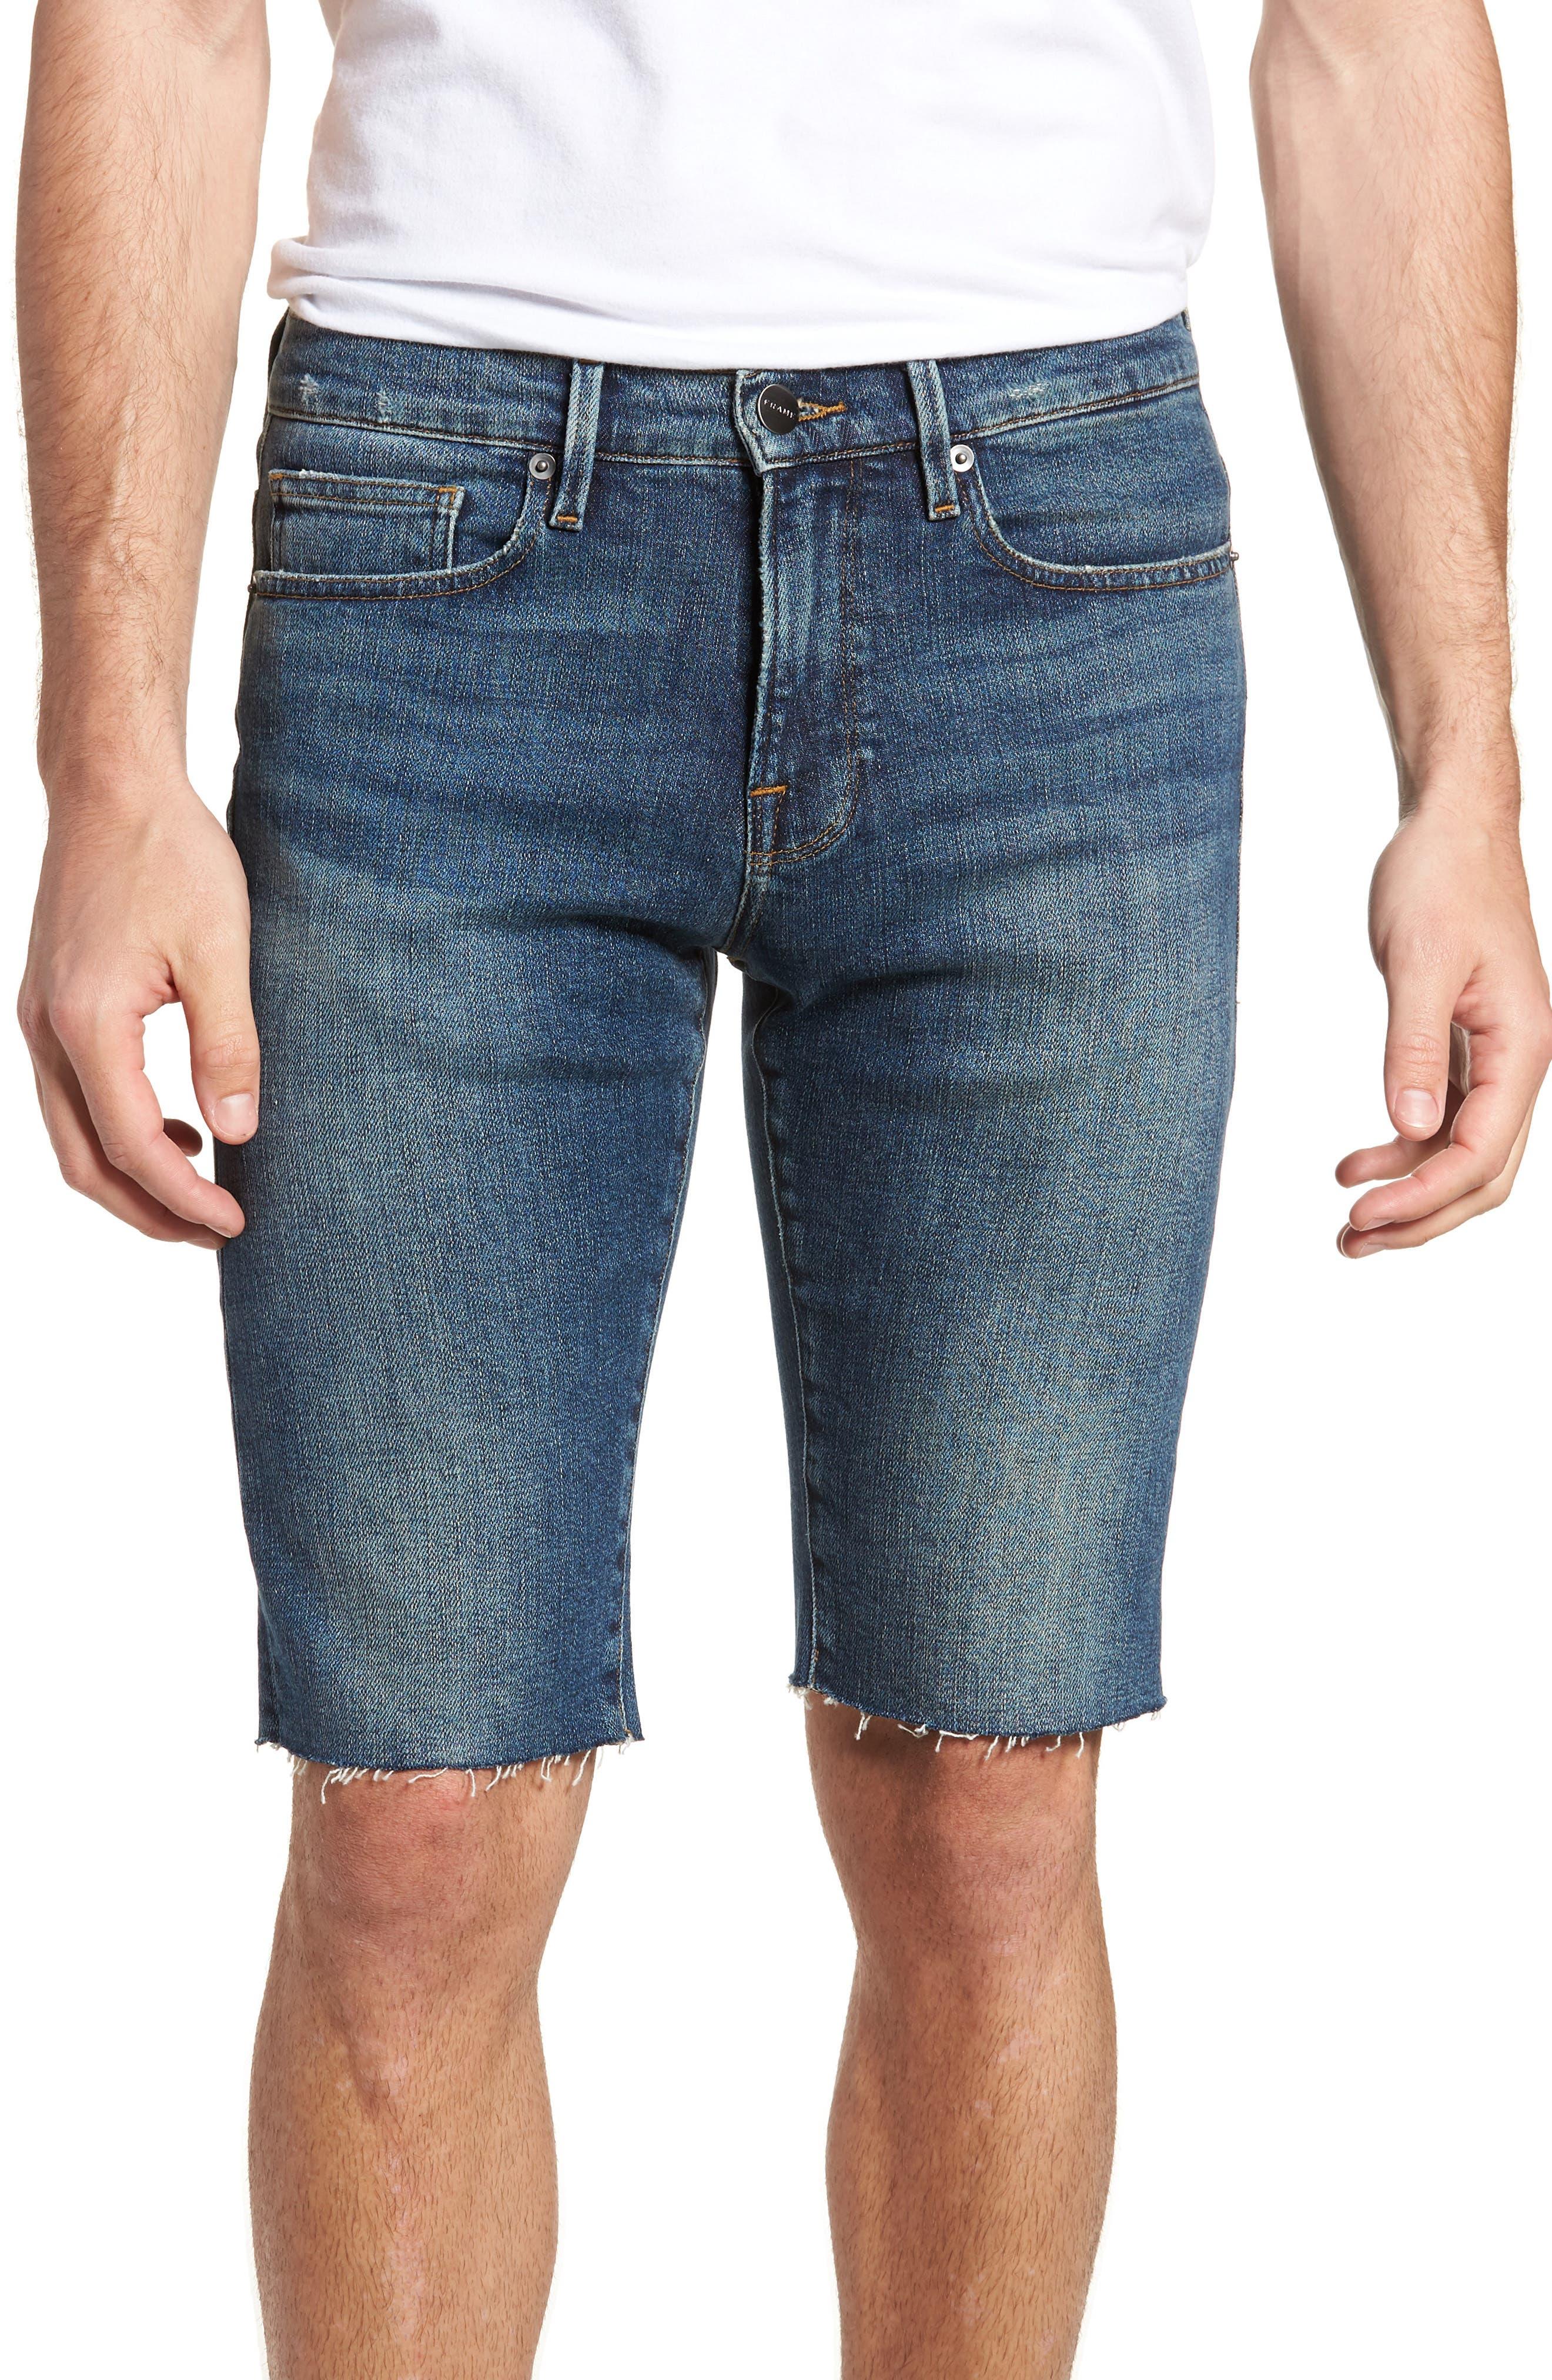 L'Homme Cutoff Shorts,                             Main thumbnail 1, color,                             KIRBY